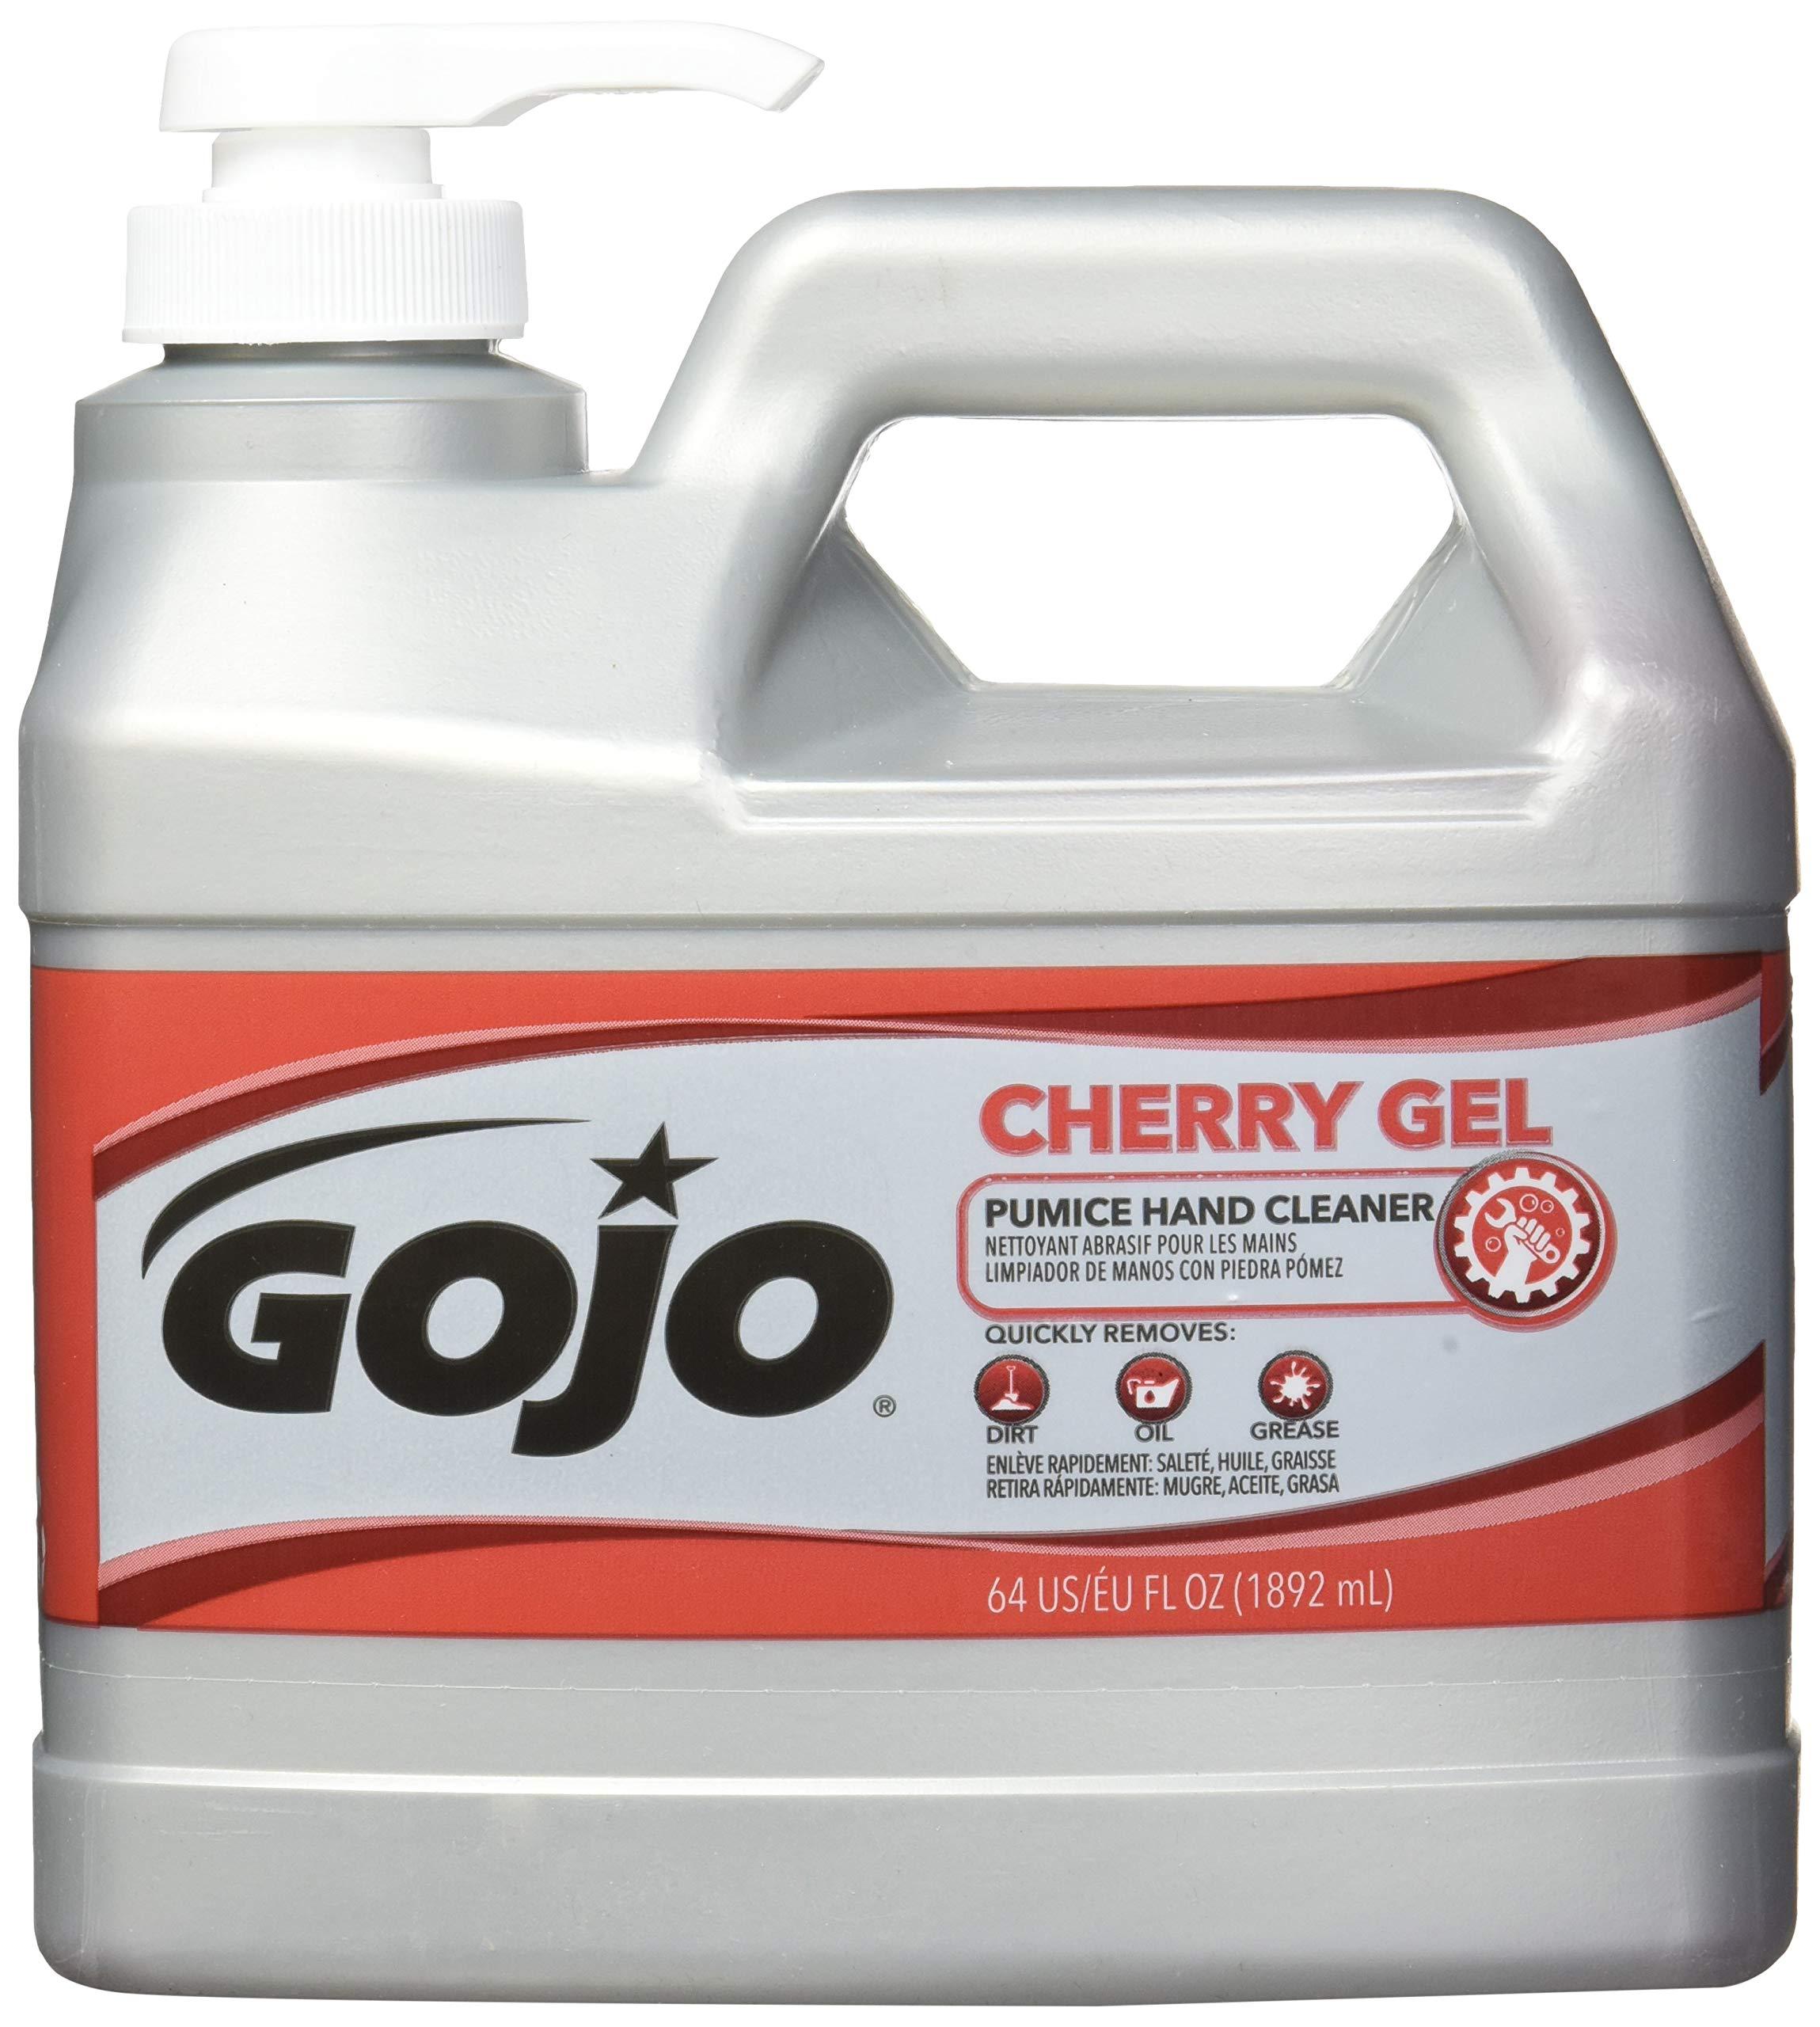 Gojo 2356-04 Cherry Gel Pumice Hand Cleaner, 0.5-gallon by Gojo (Image #2)